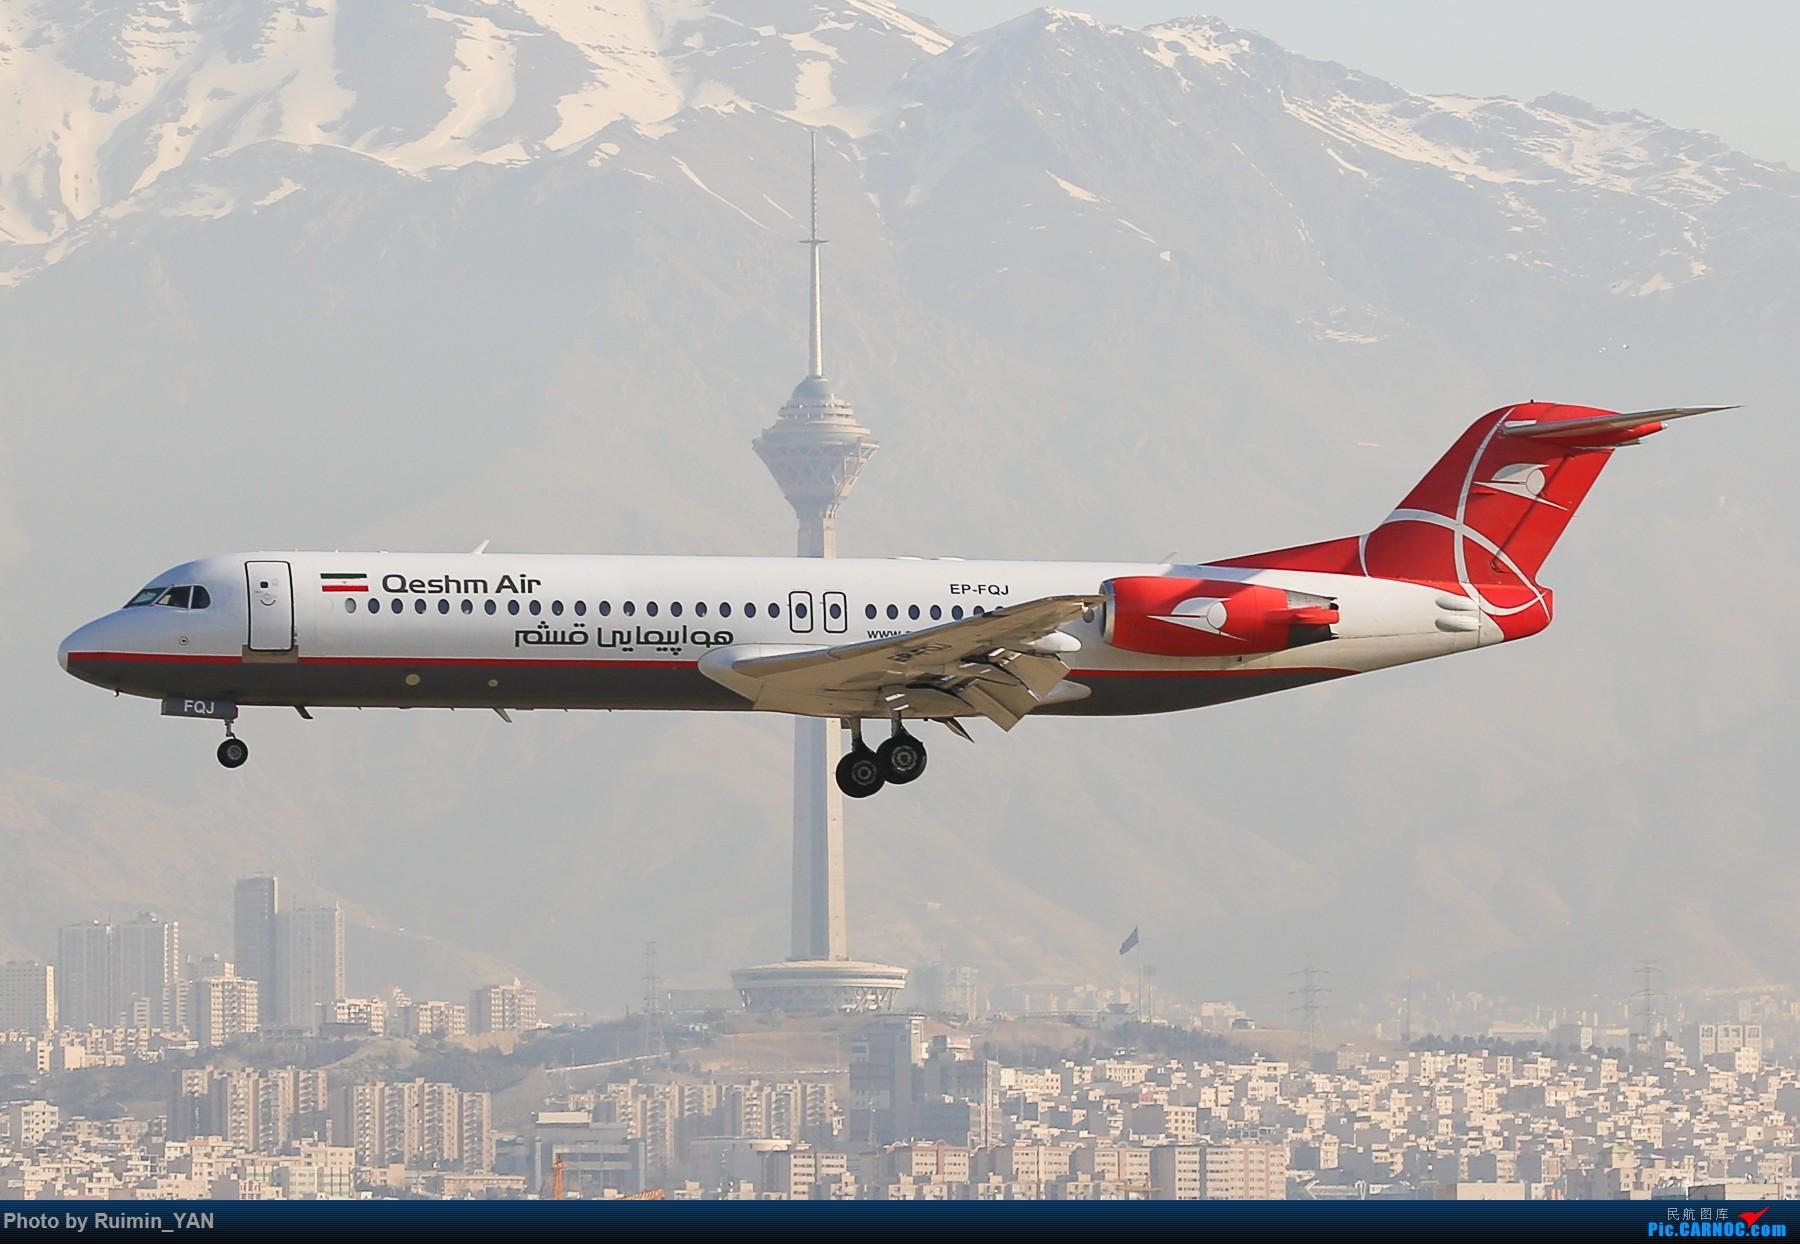 【THR】(德黑兰梅赫拉巴德机场)伊朗Qeshm航空(Qeshm Airlines,QB)--福克100 FOKKER 100 EP-FQJ 伊朗德黑兰机场